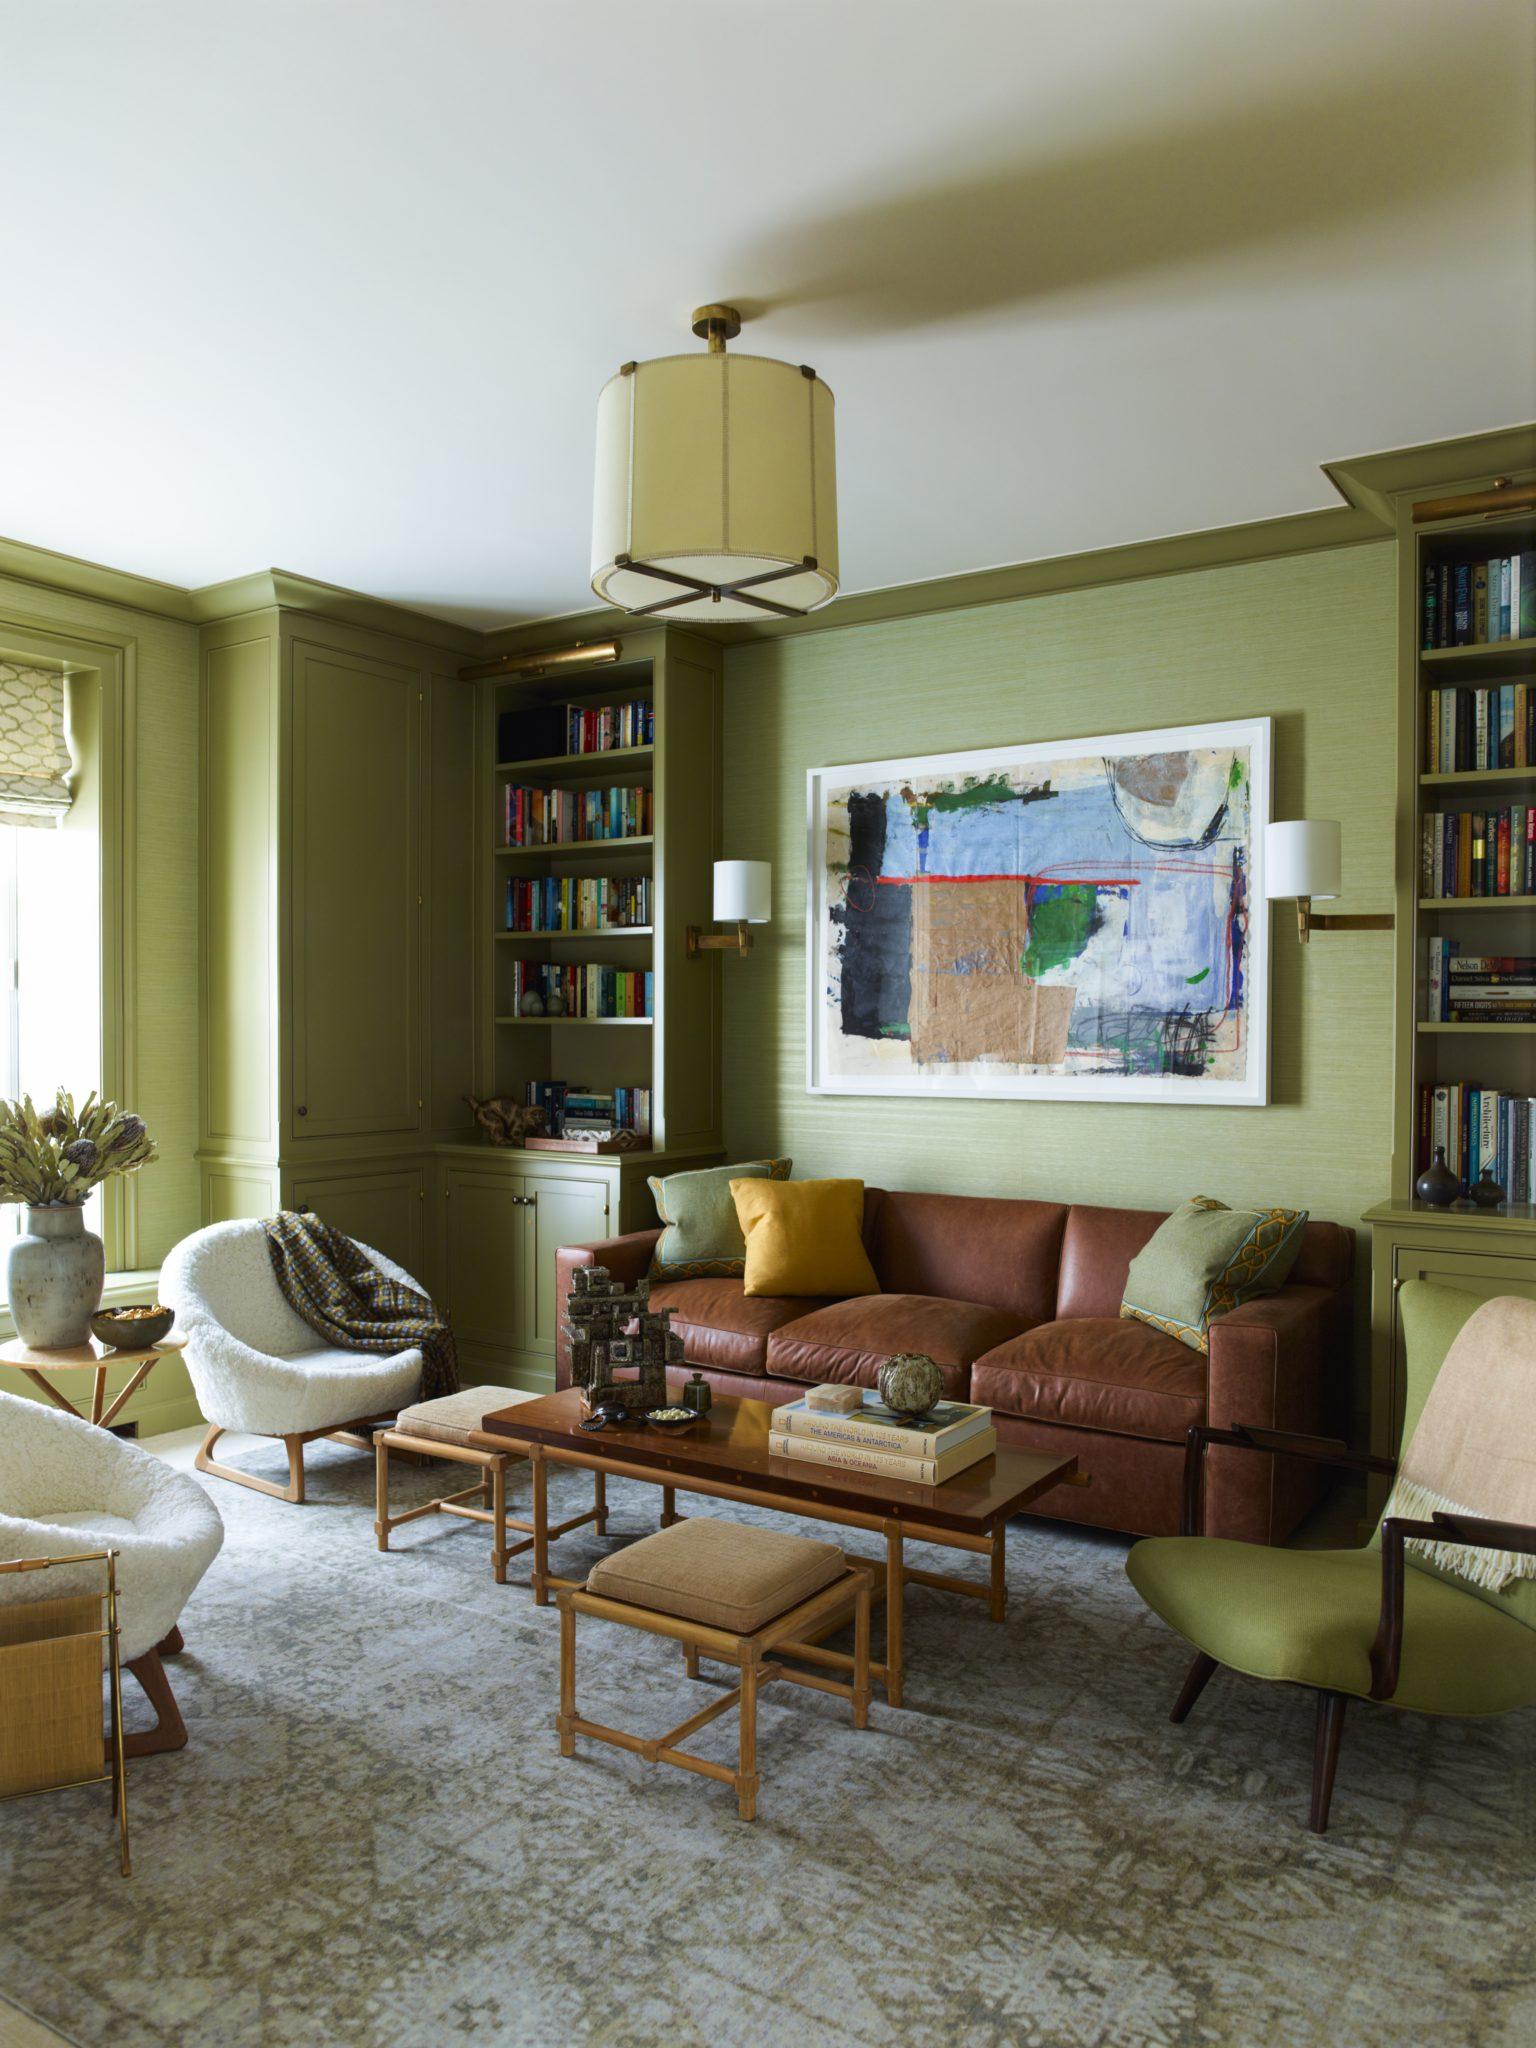 Interior design byMendelson Group, Inc.